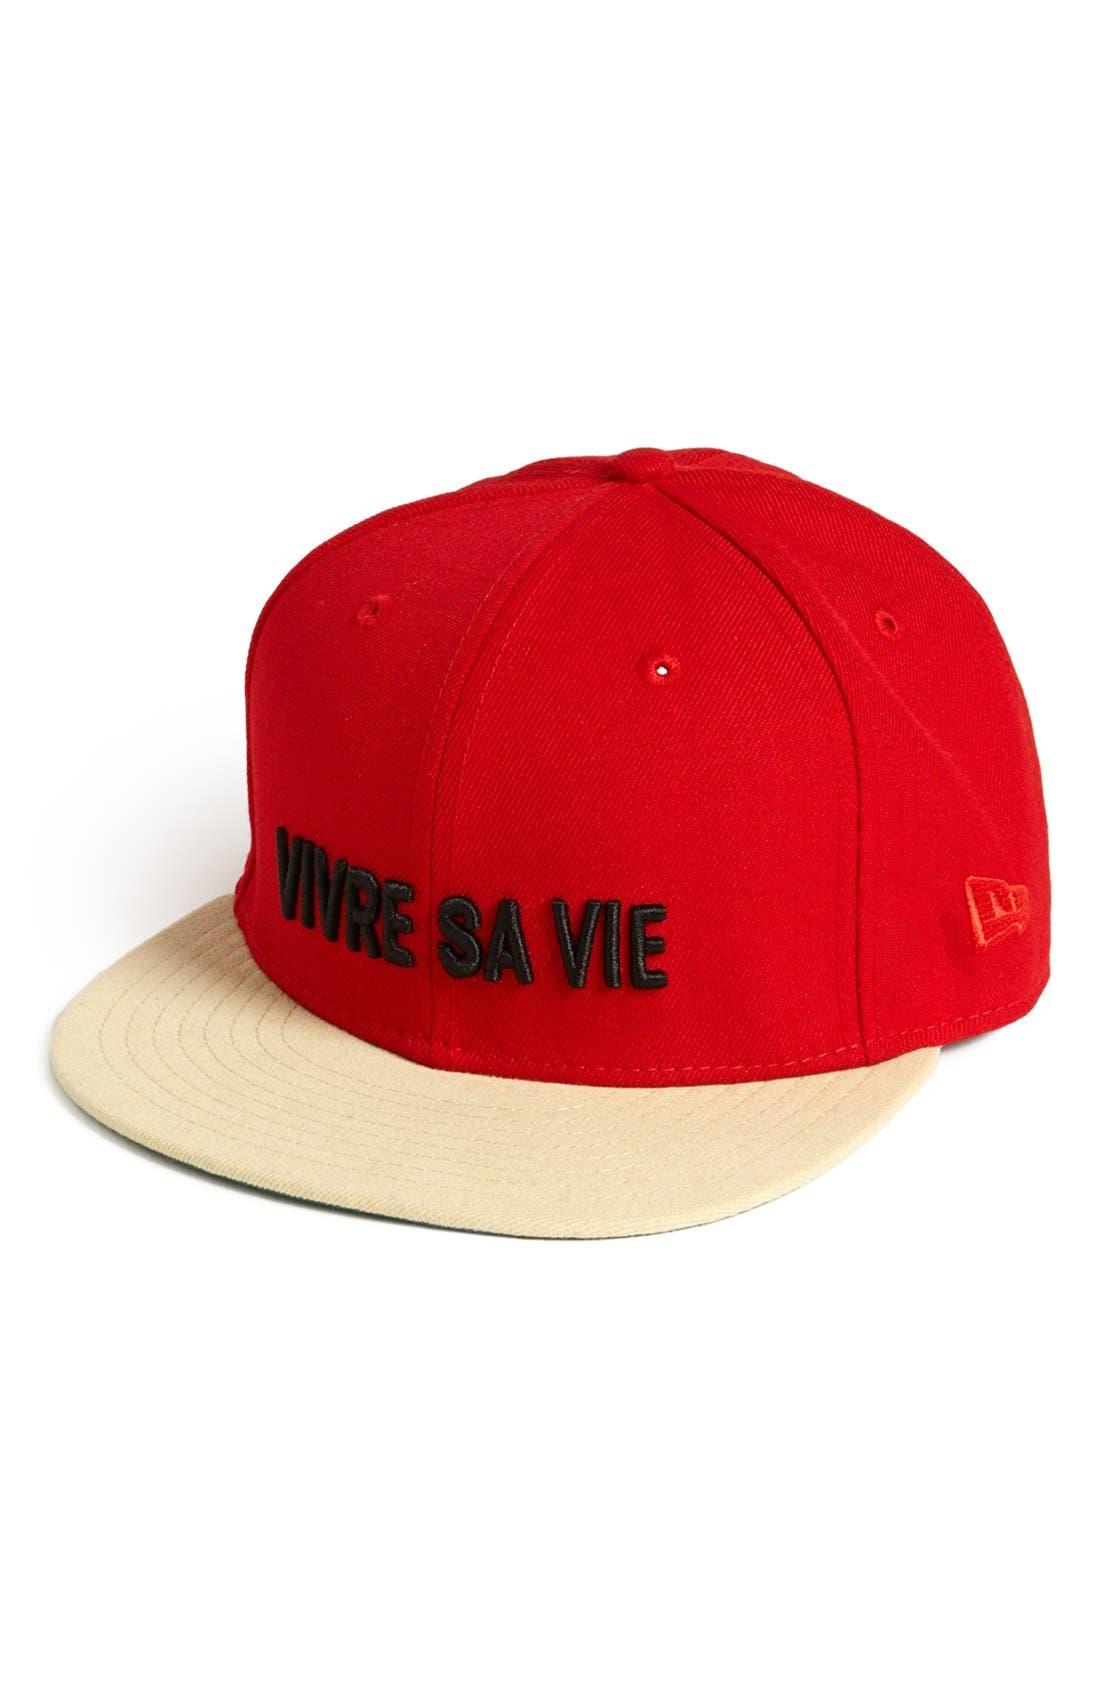 NEW ERA CAP, 'Vivre Sa Vie' Baseball Cap, Alternate thumbnail 3, color, 600